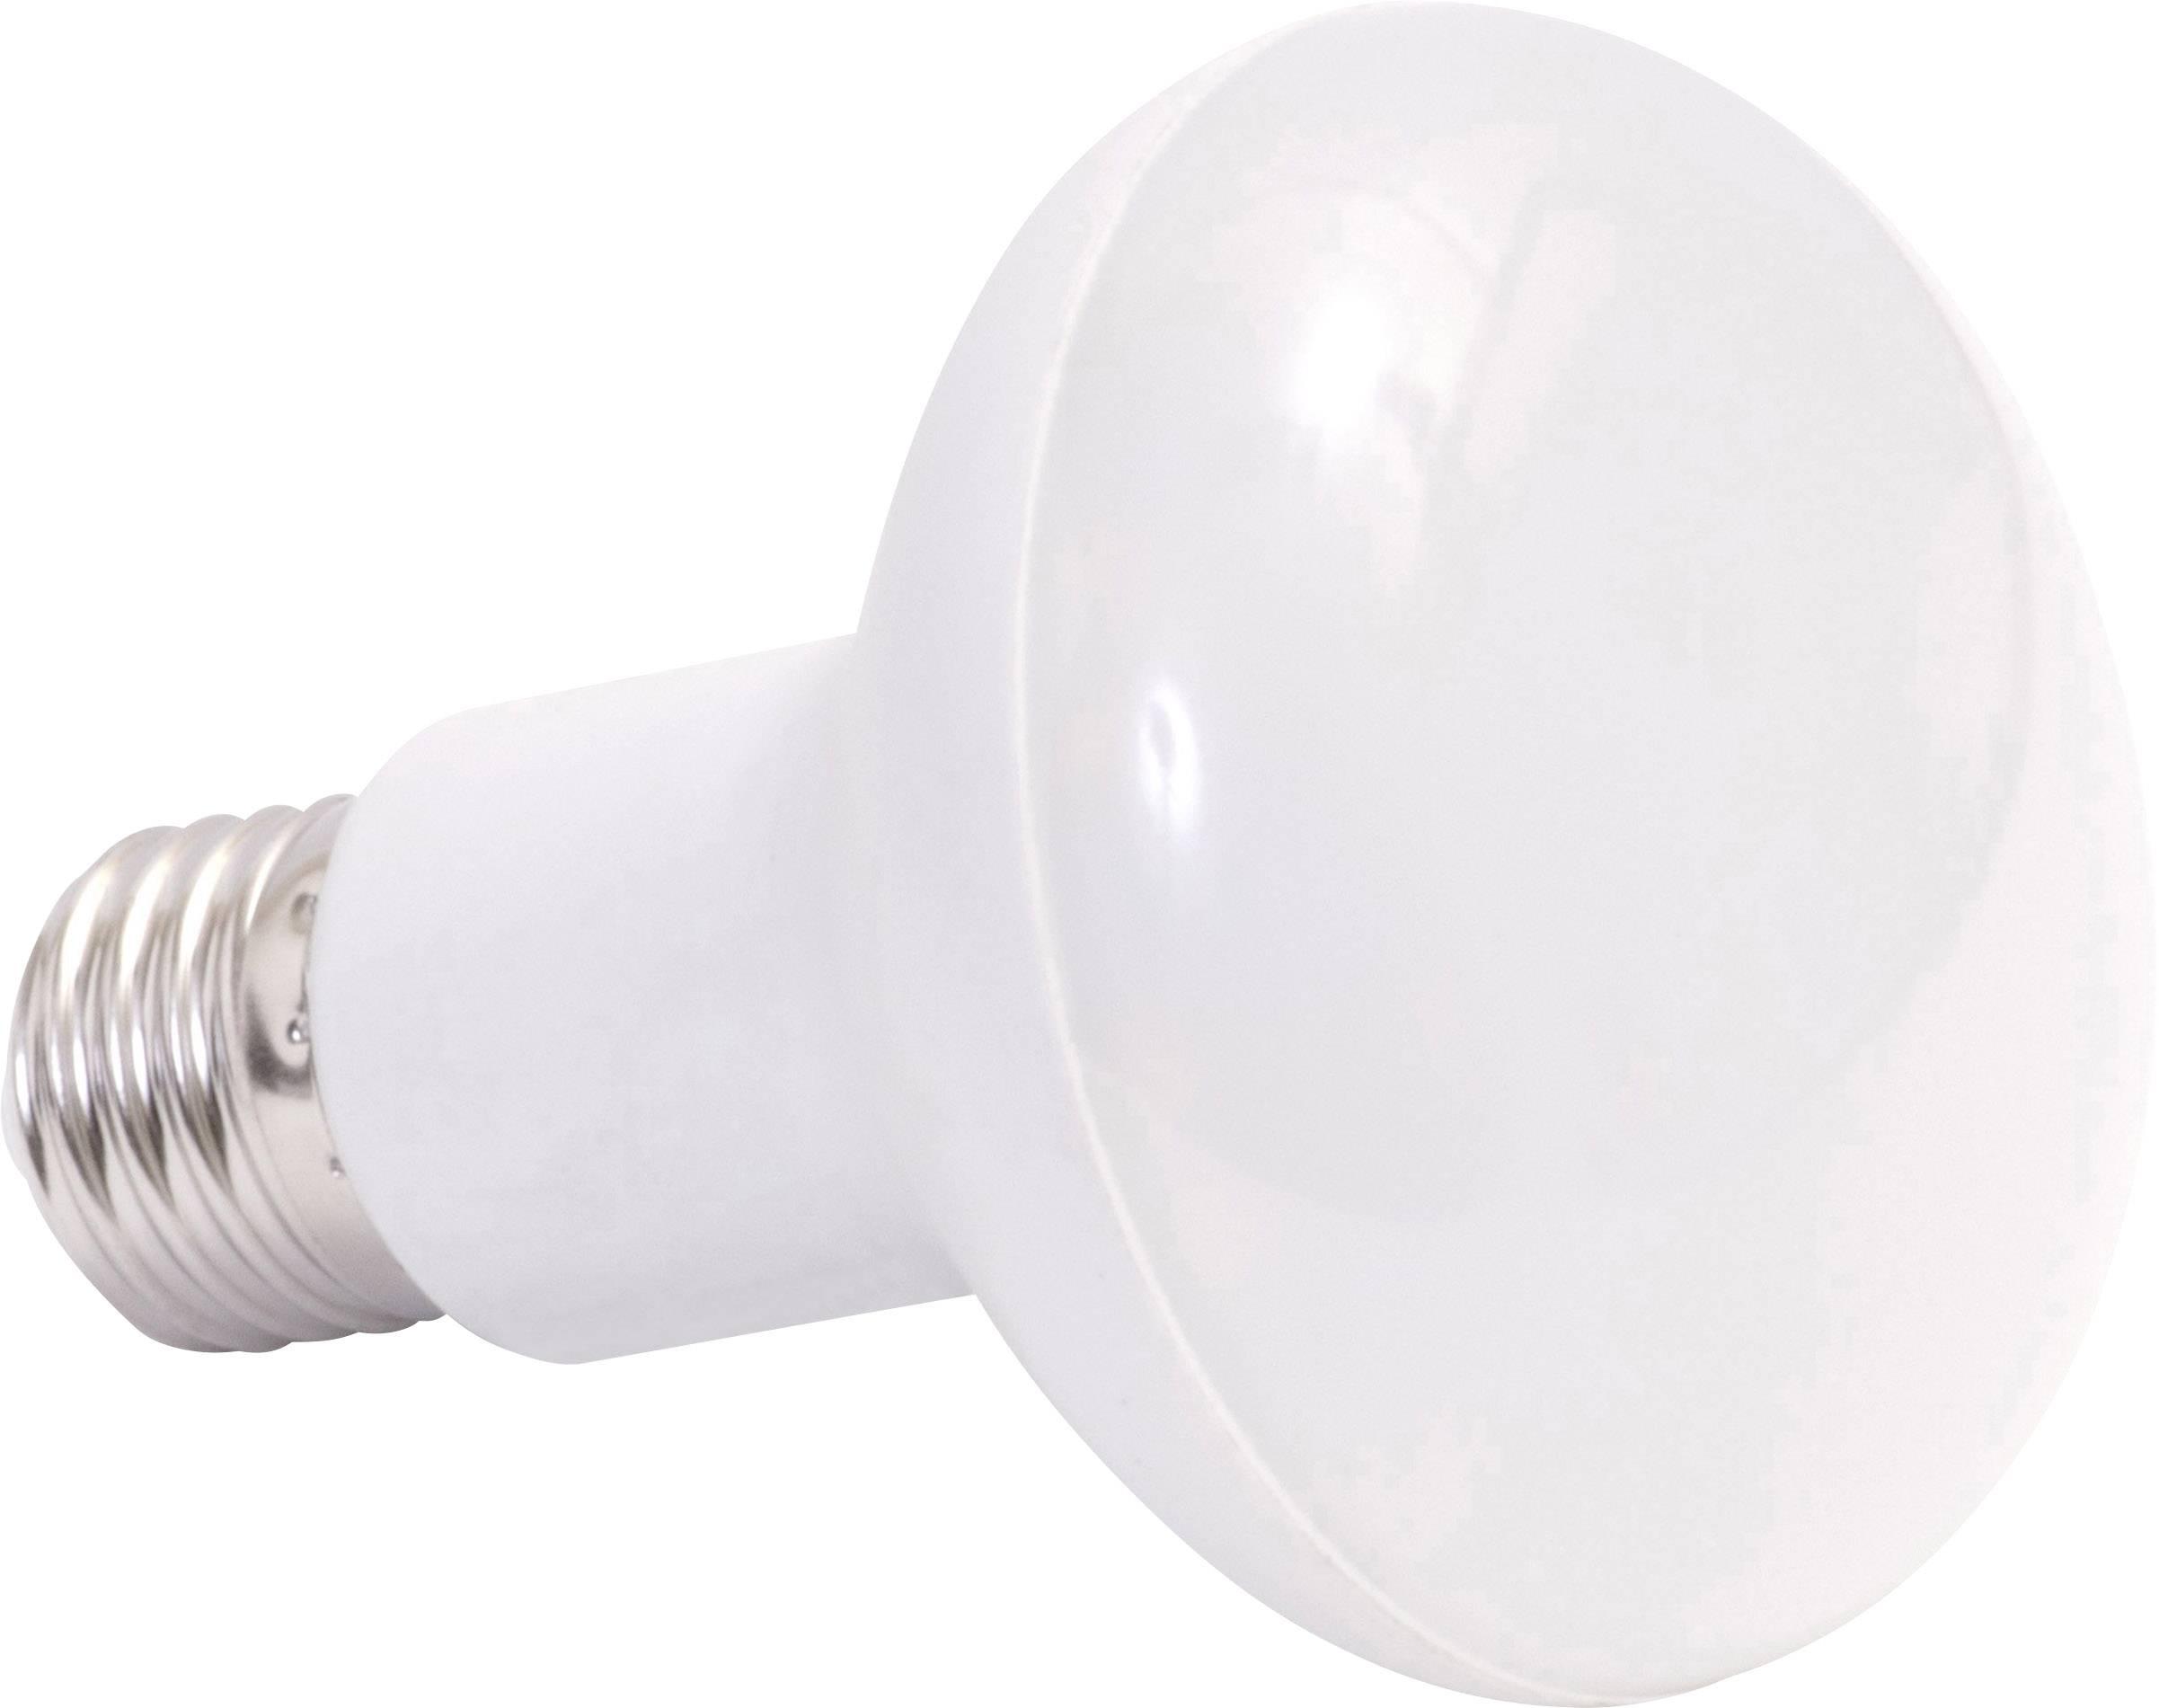 helle lampen für sehbehinderte